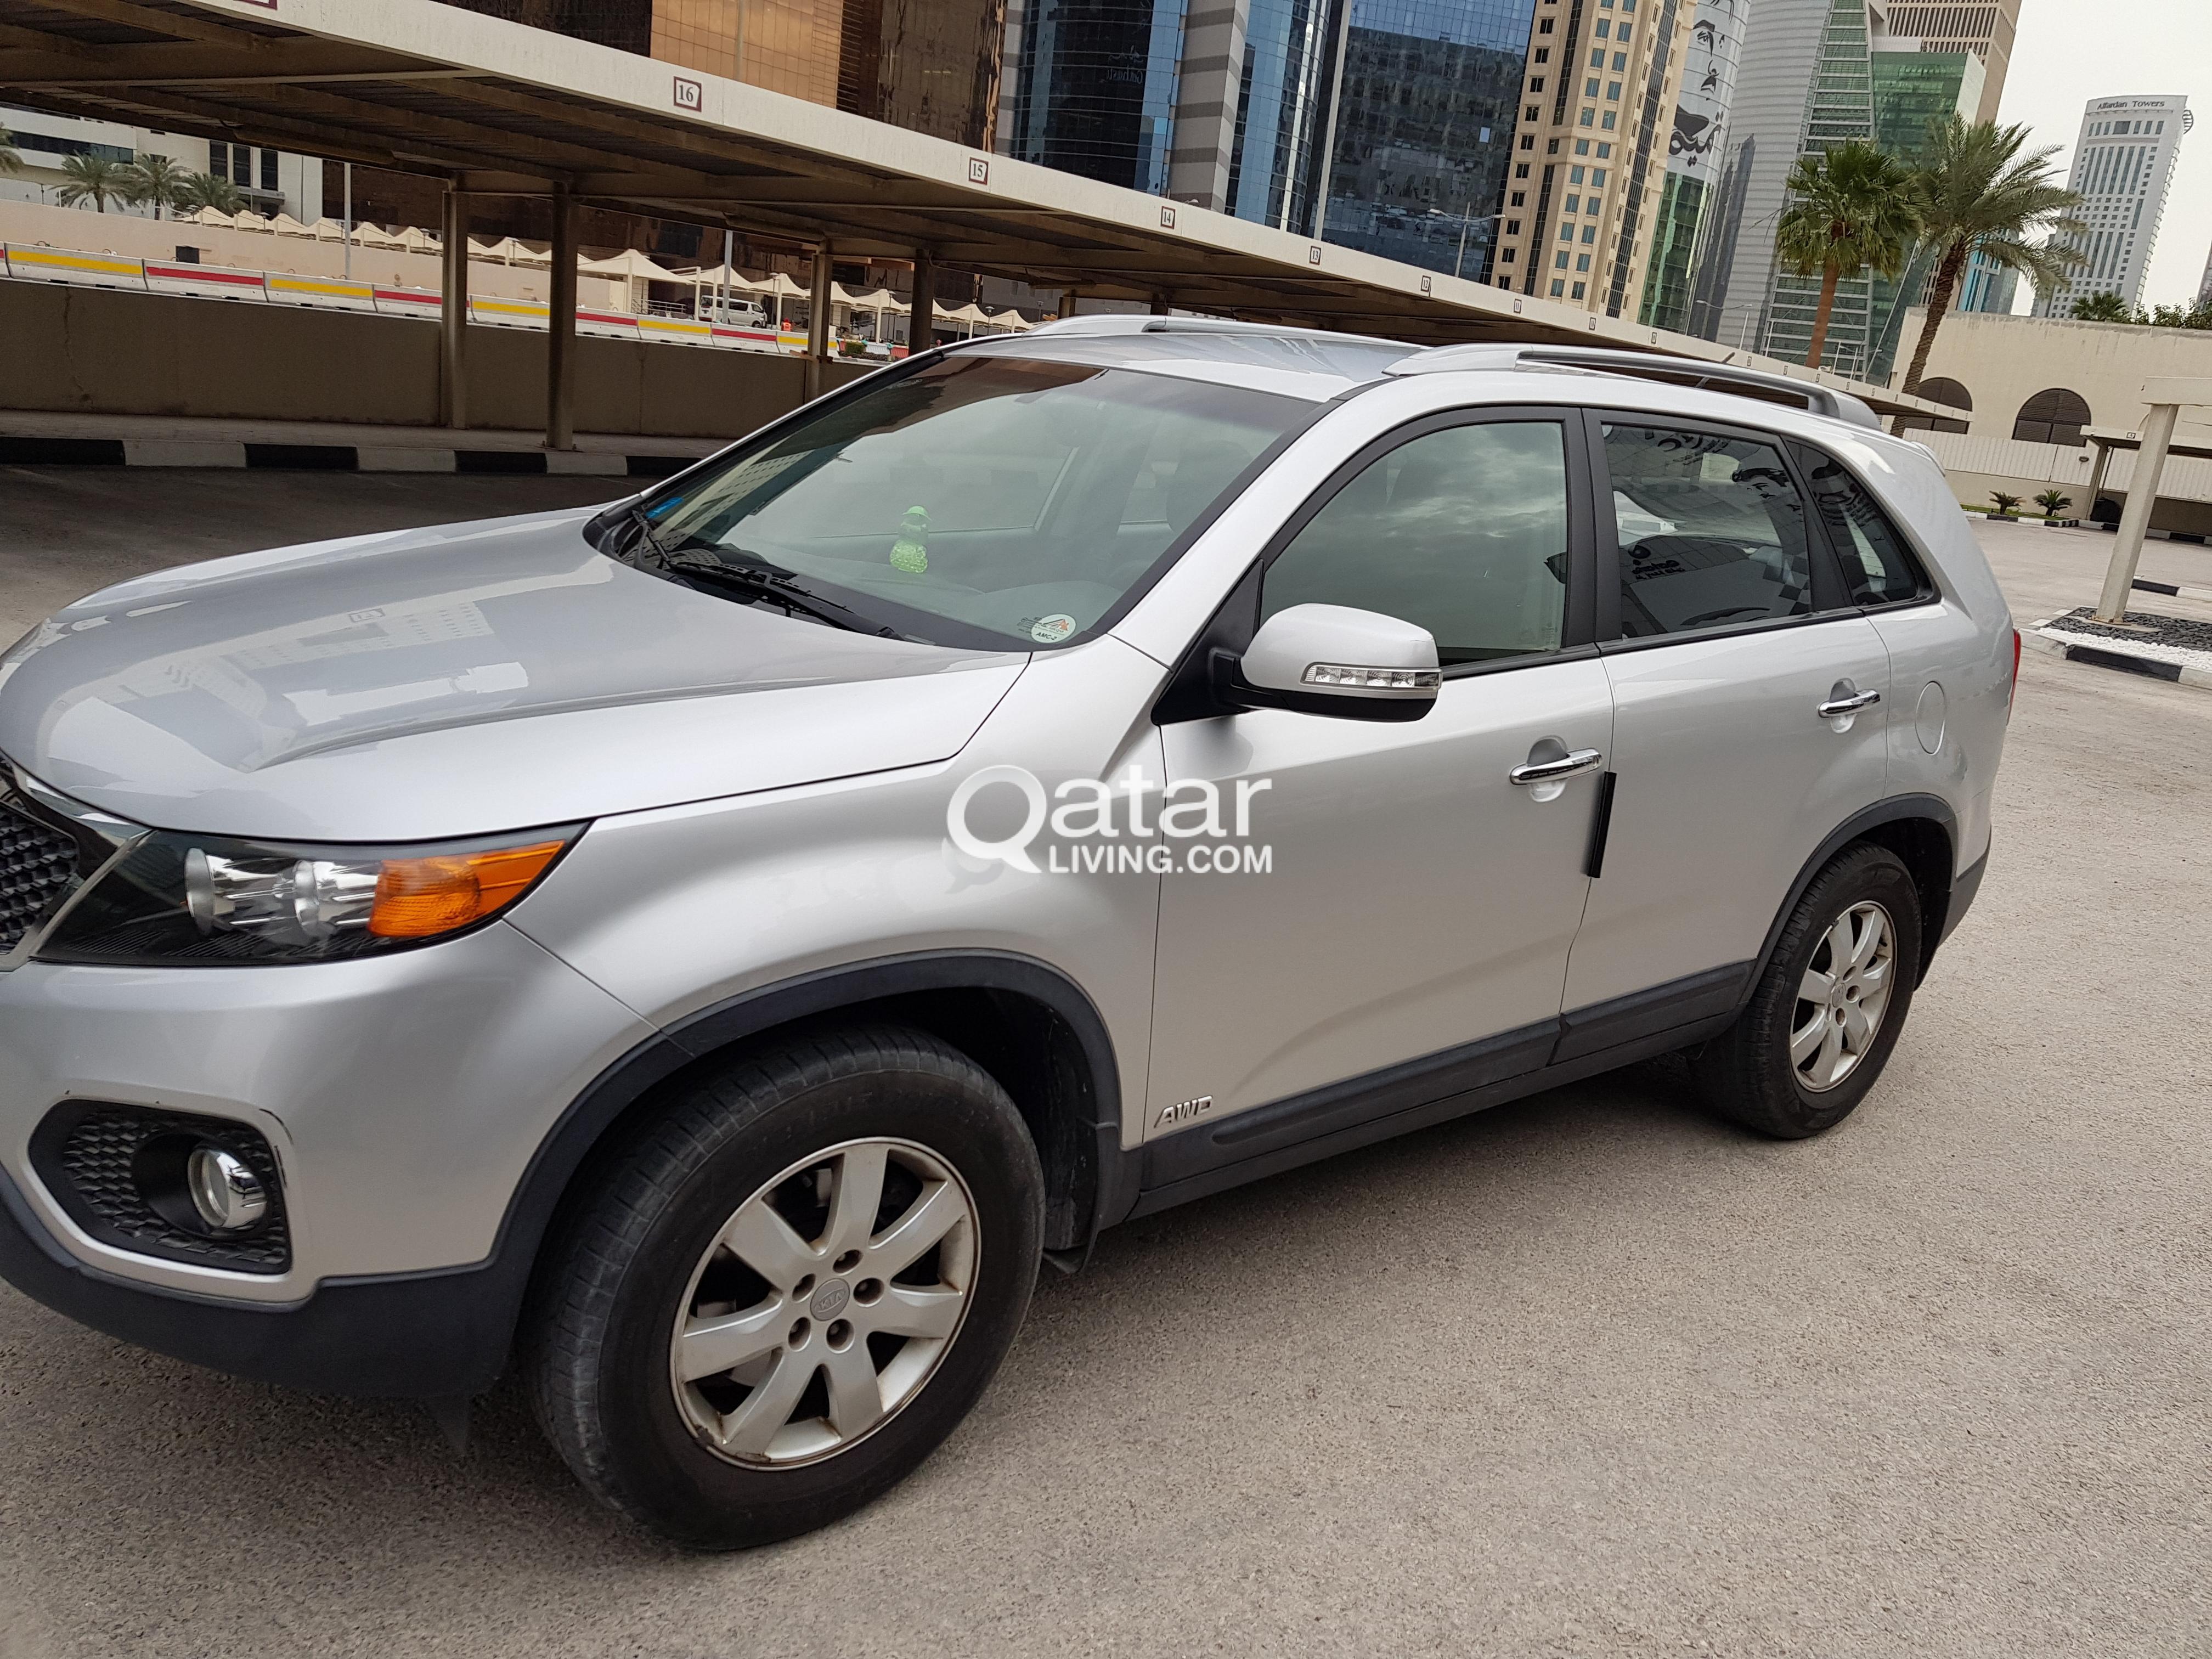 option sorento living kia qatar mid vehicles